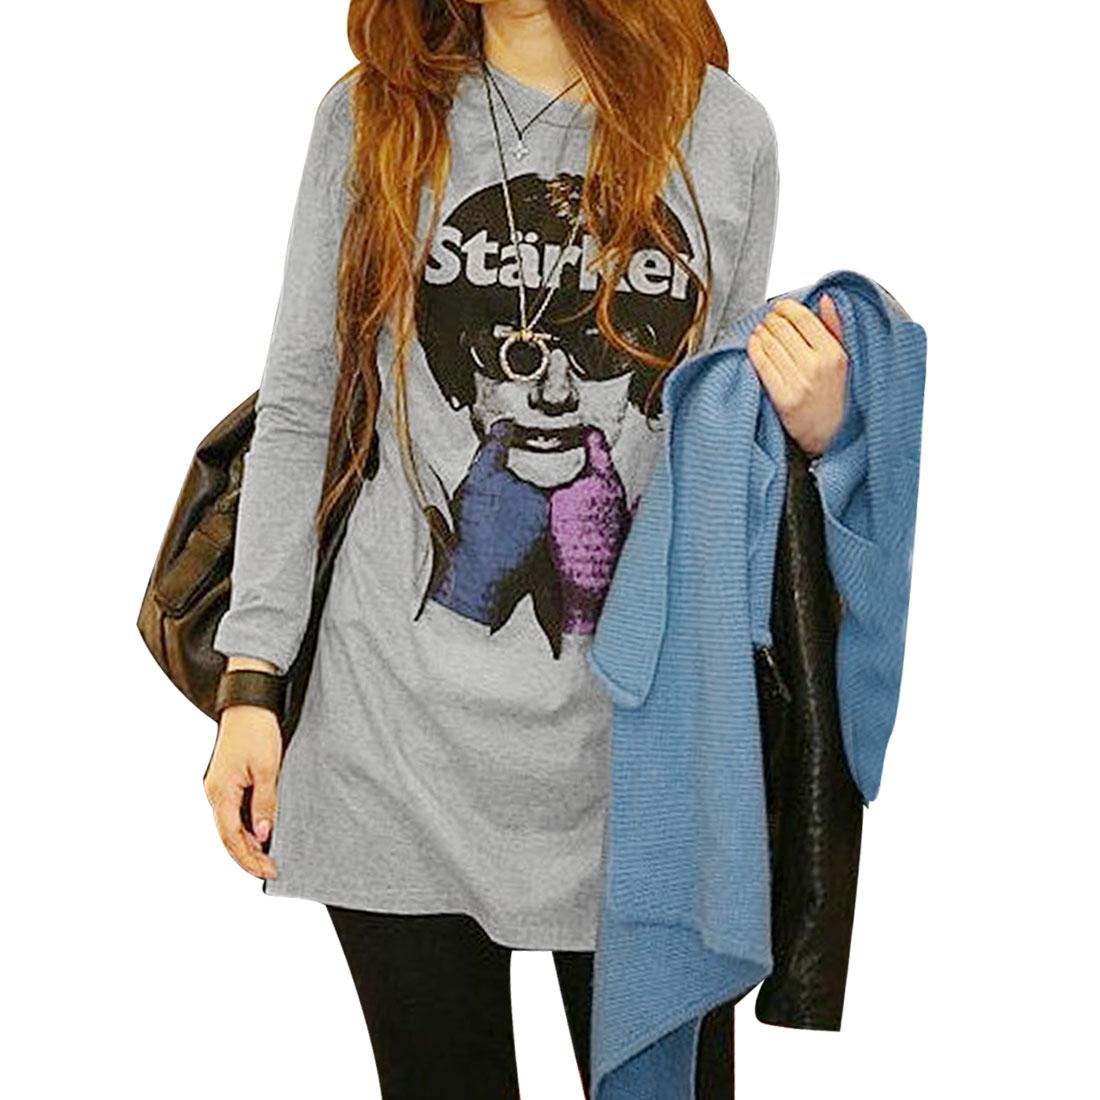 CQ10121710 Woman Round Neck Long Sleeves Gray Black Shirt